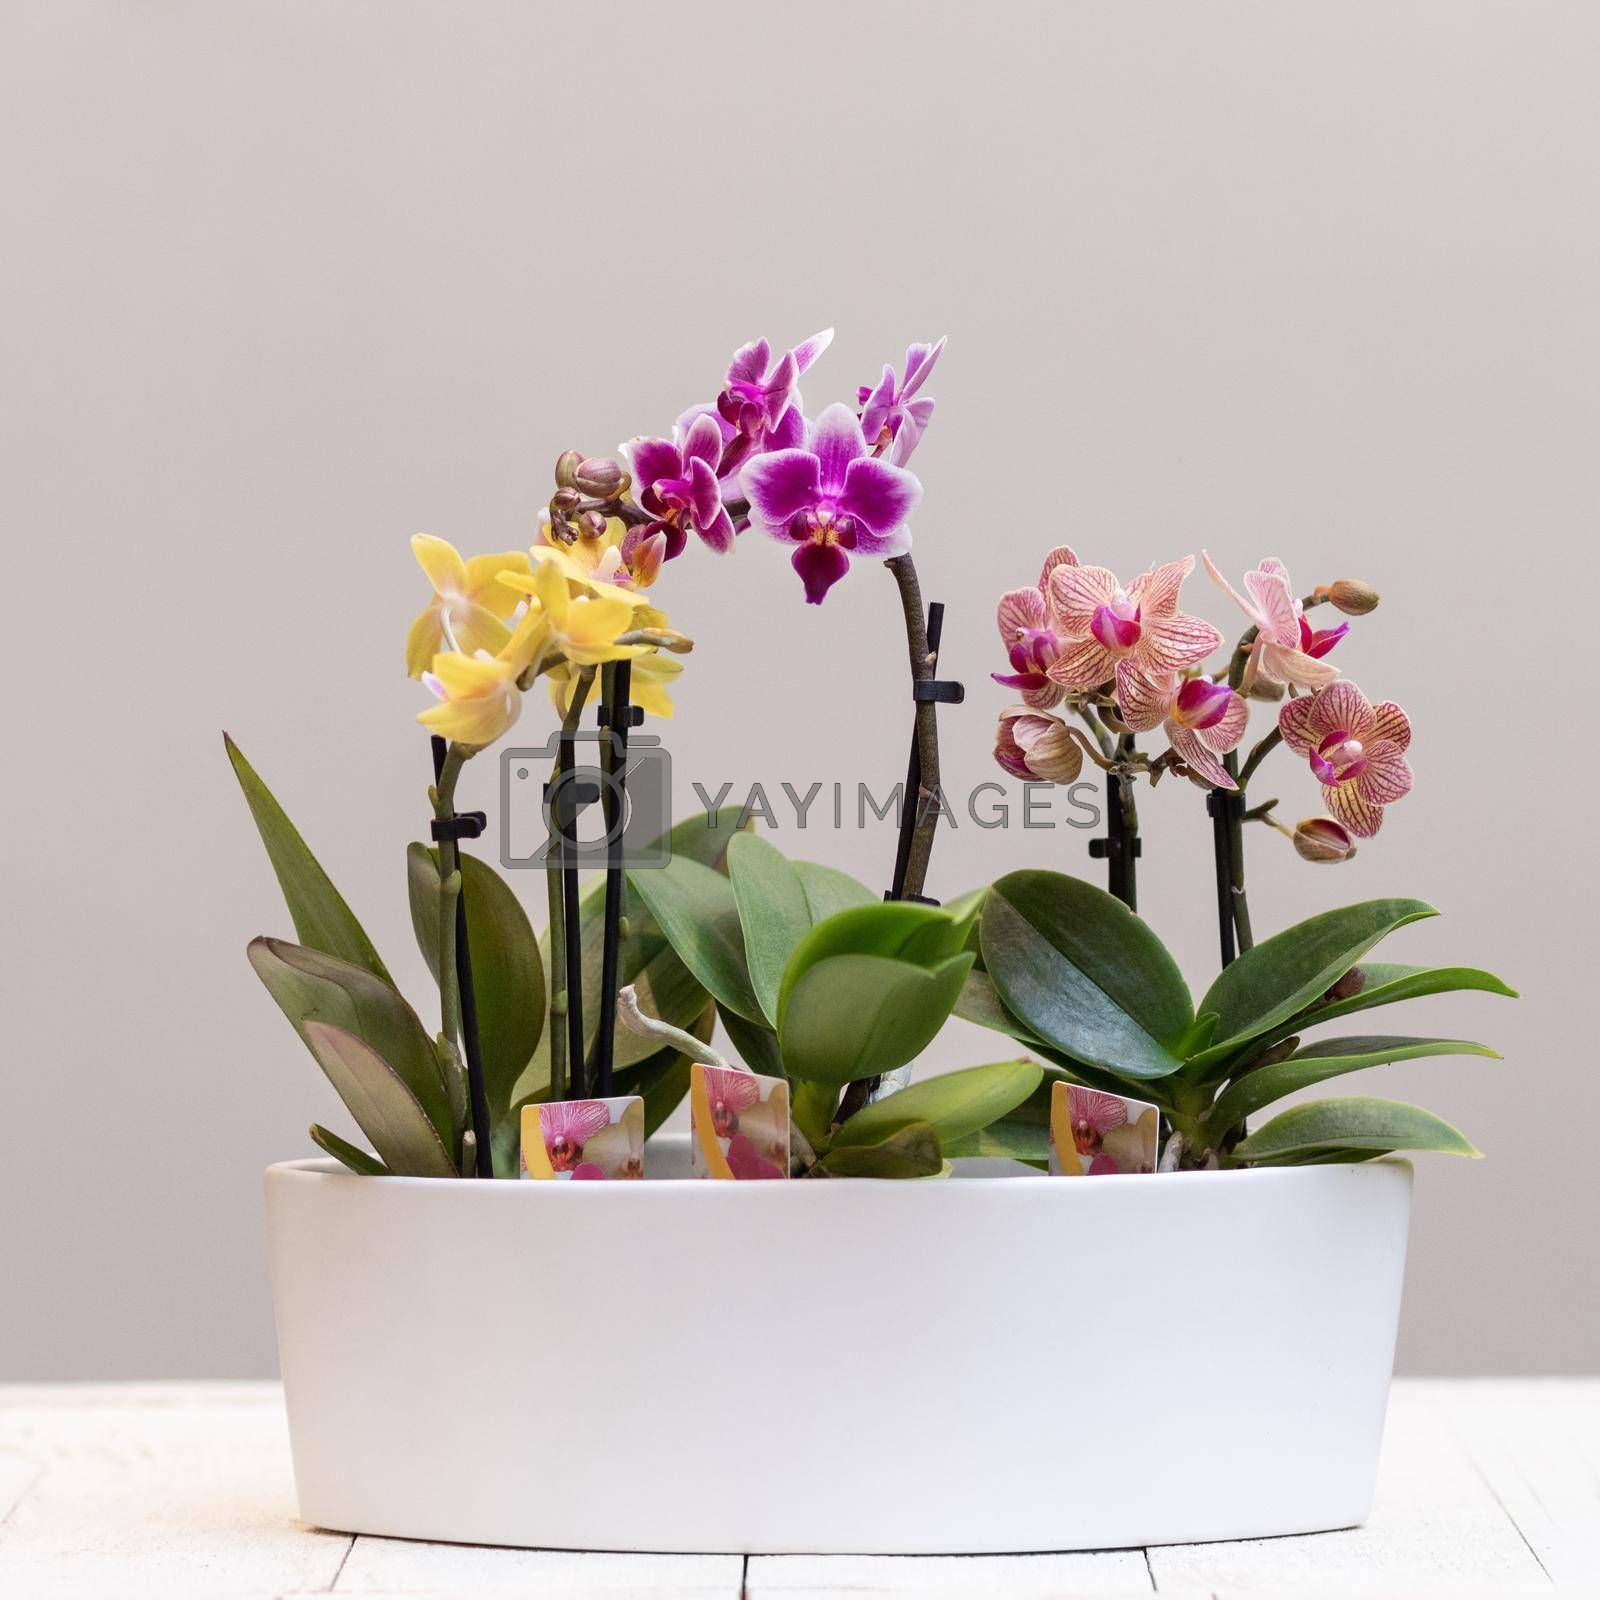 Boat orchid, cymbidium in the white pot